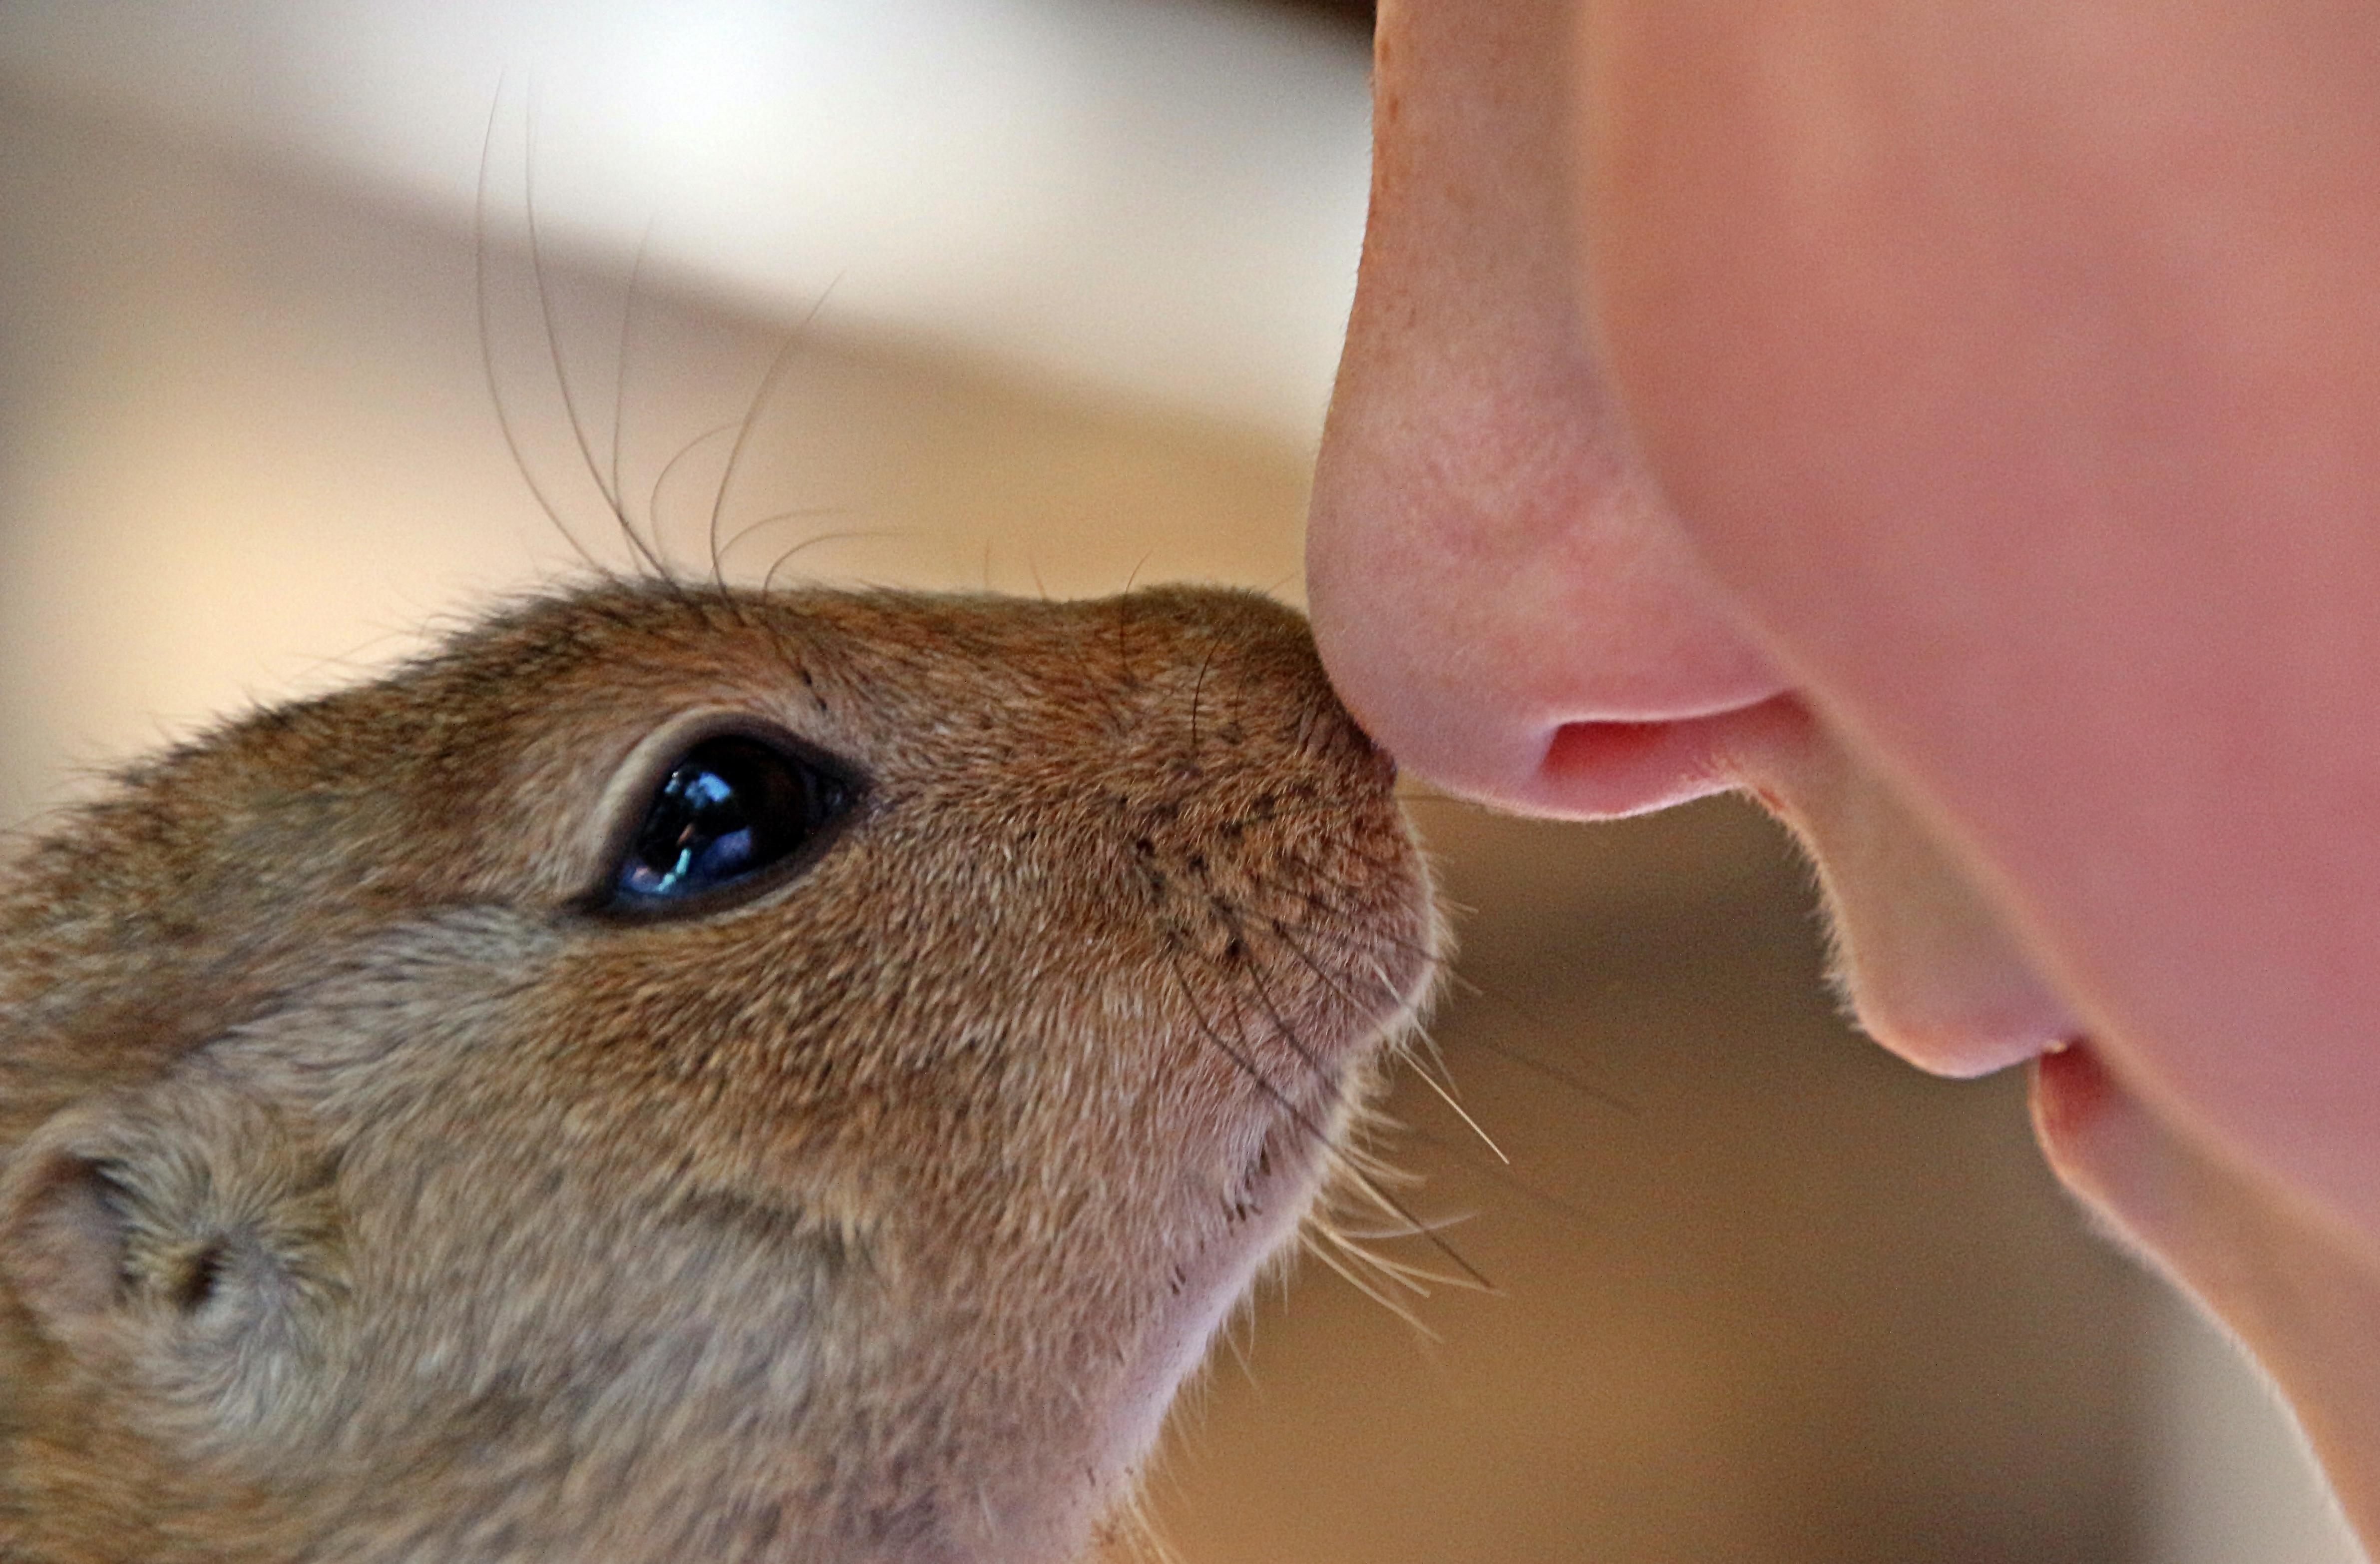 Free Images Mammal Hamster Rodent Fauna Close Up Whiskers Cheek Eye Skin Lips Vertebrate Trust Closeness Carefully Prairie Dog